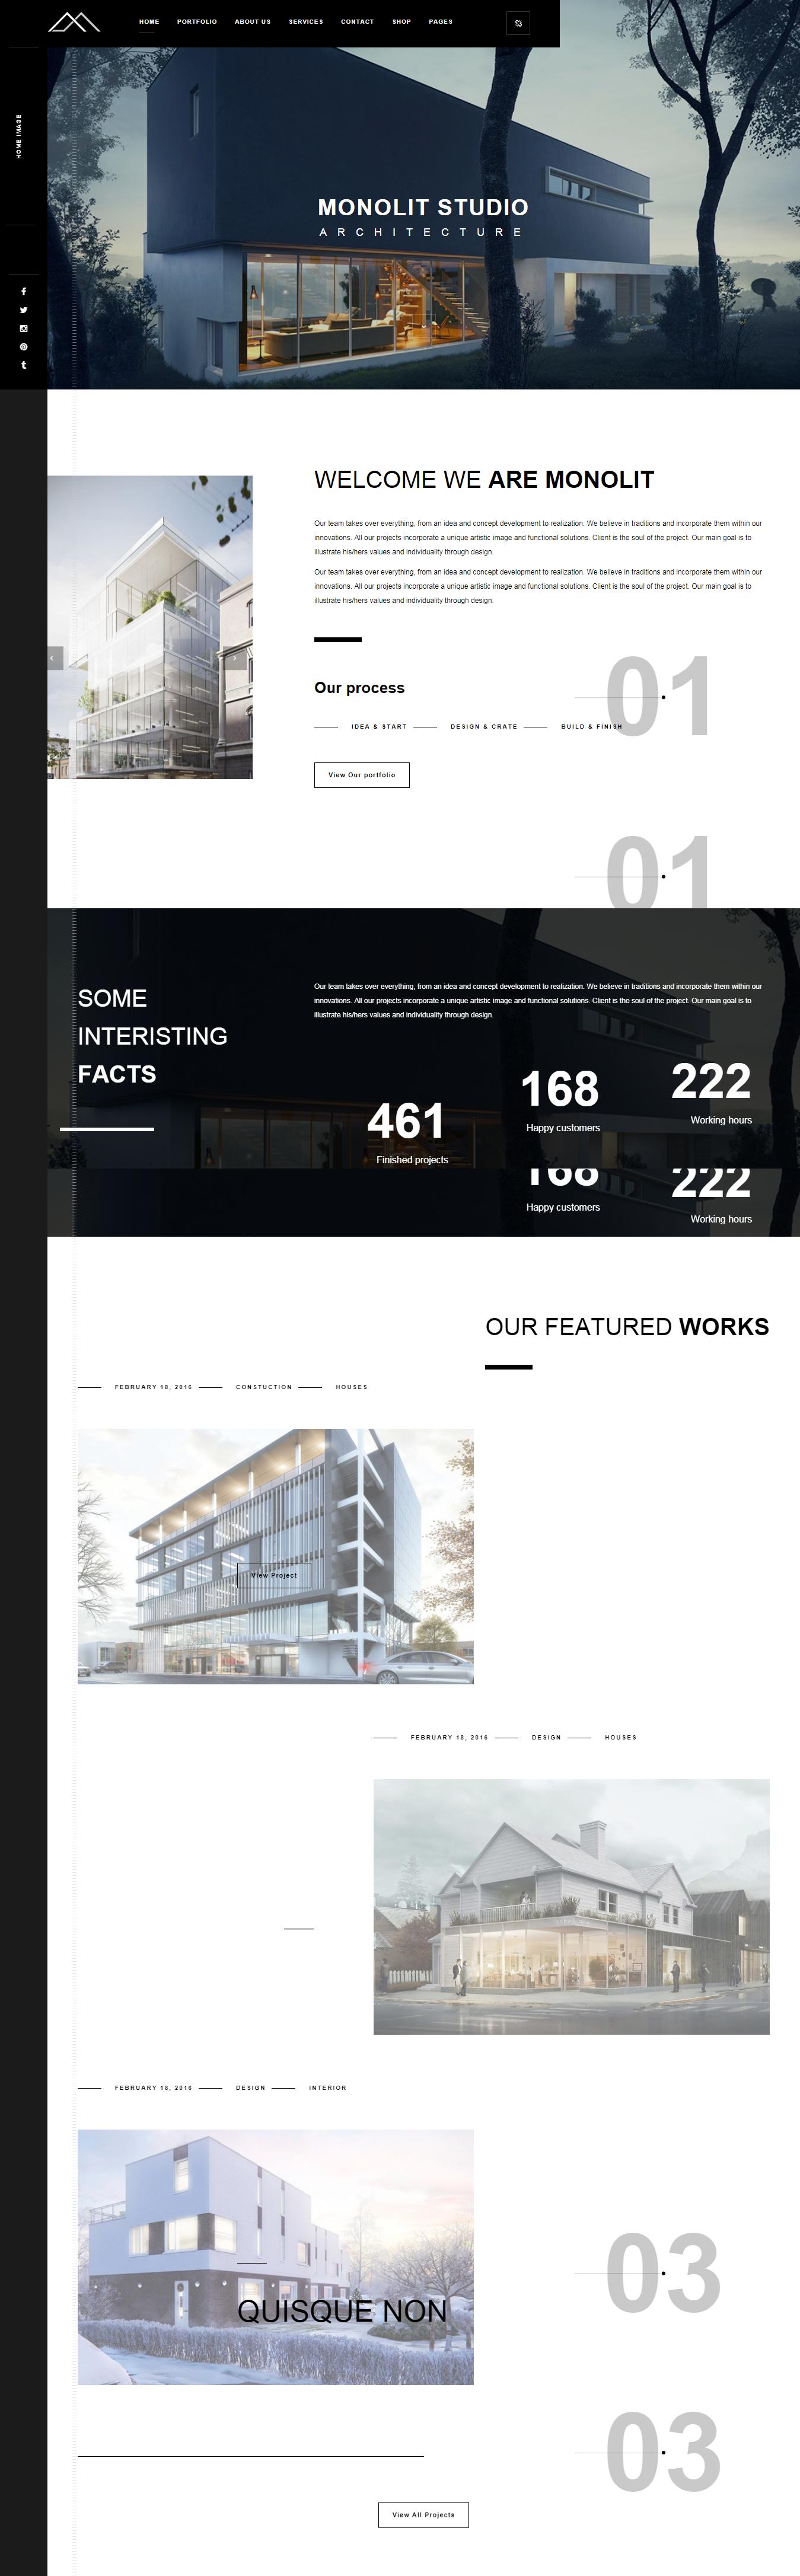 monolit best premium architecture wordpress theme 1 - 10+ Best Premium Architecture WordPress Themes